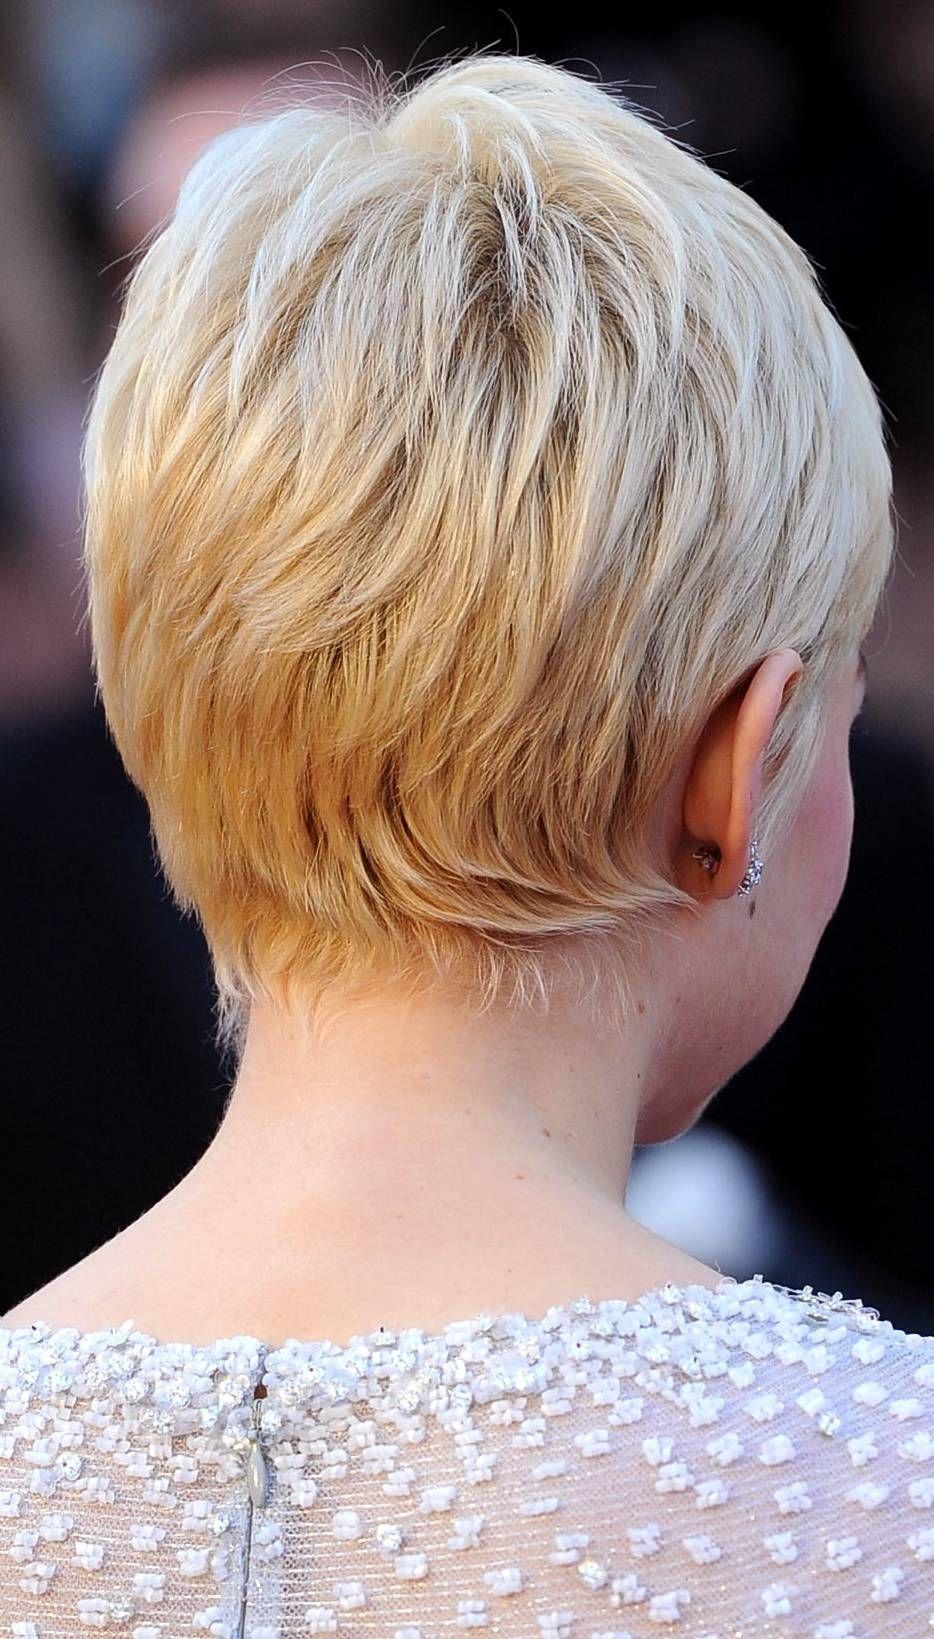 Pixie Hair 20 Amazing Pixie Hairstyles Michelle Williams Hair Short Hair Styles Short Hair Back